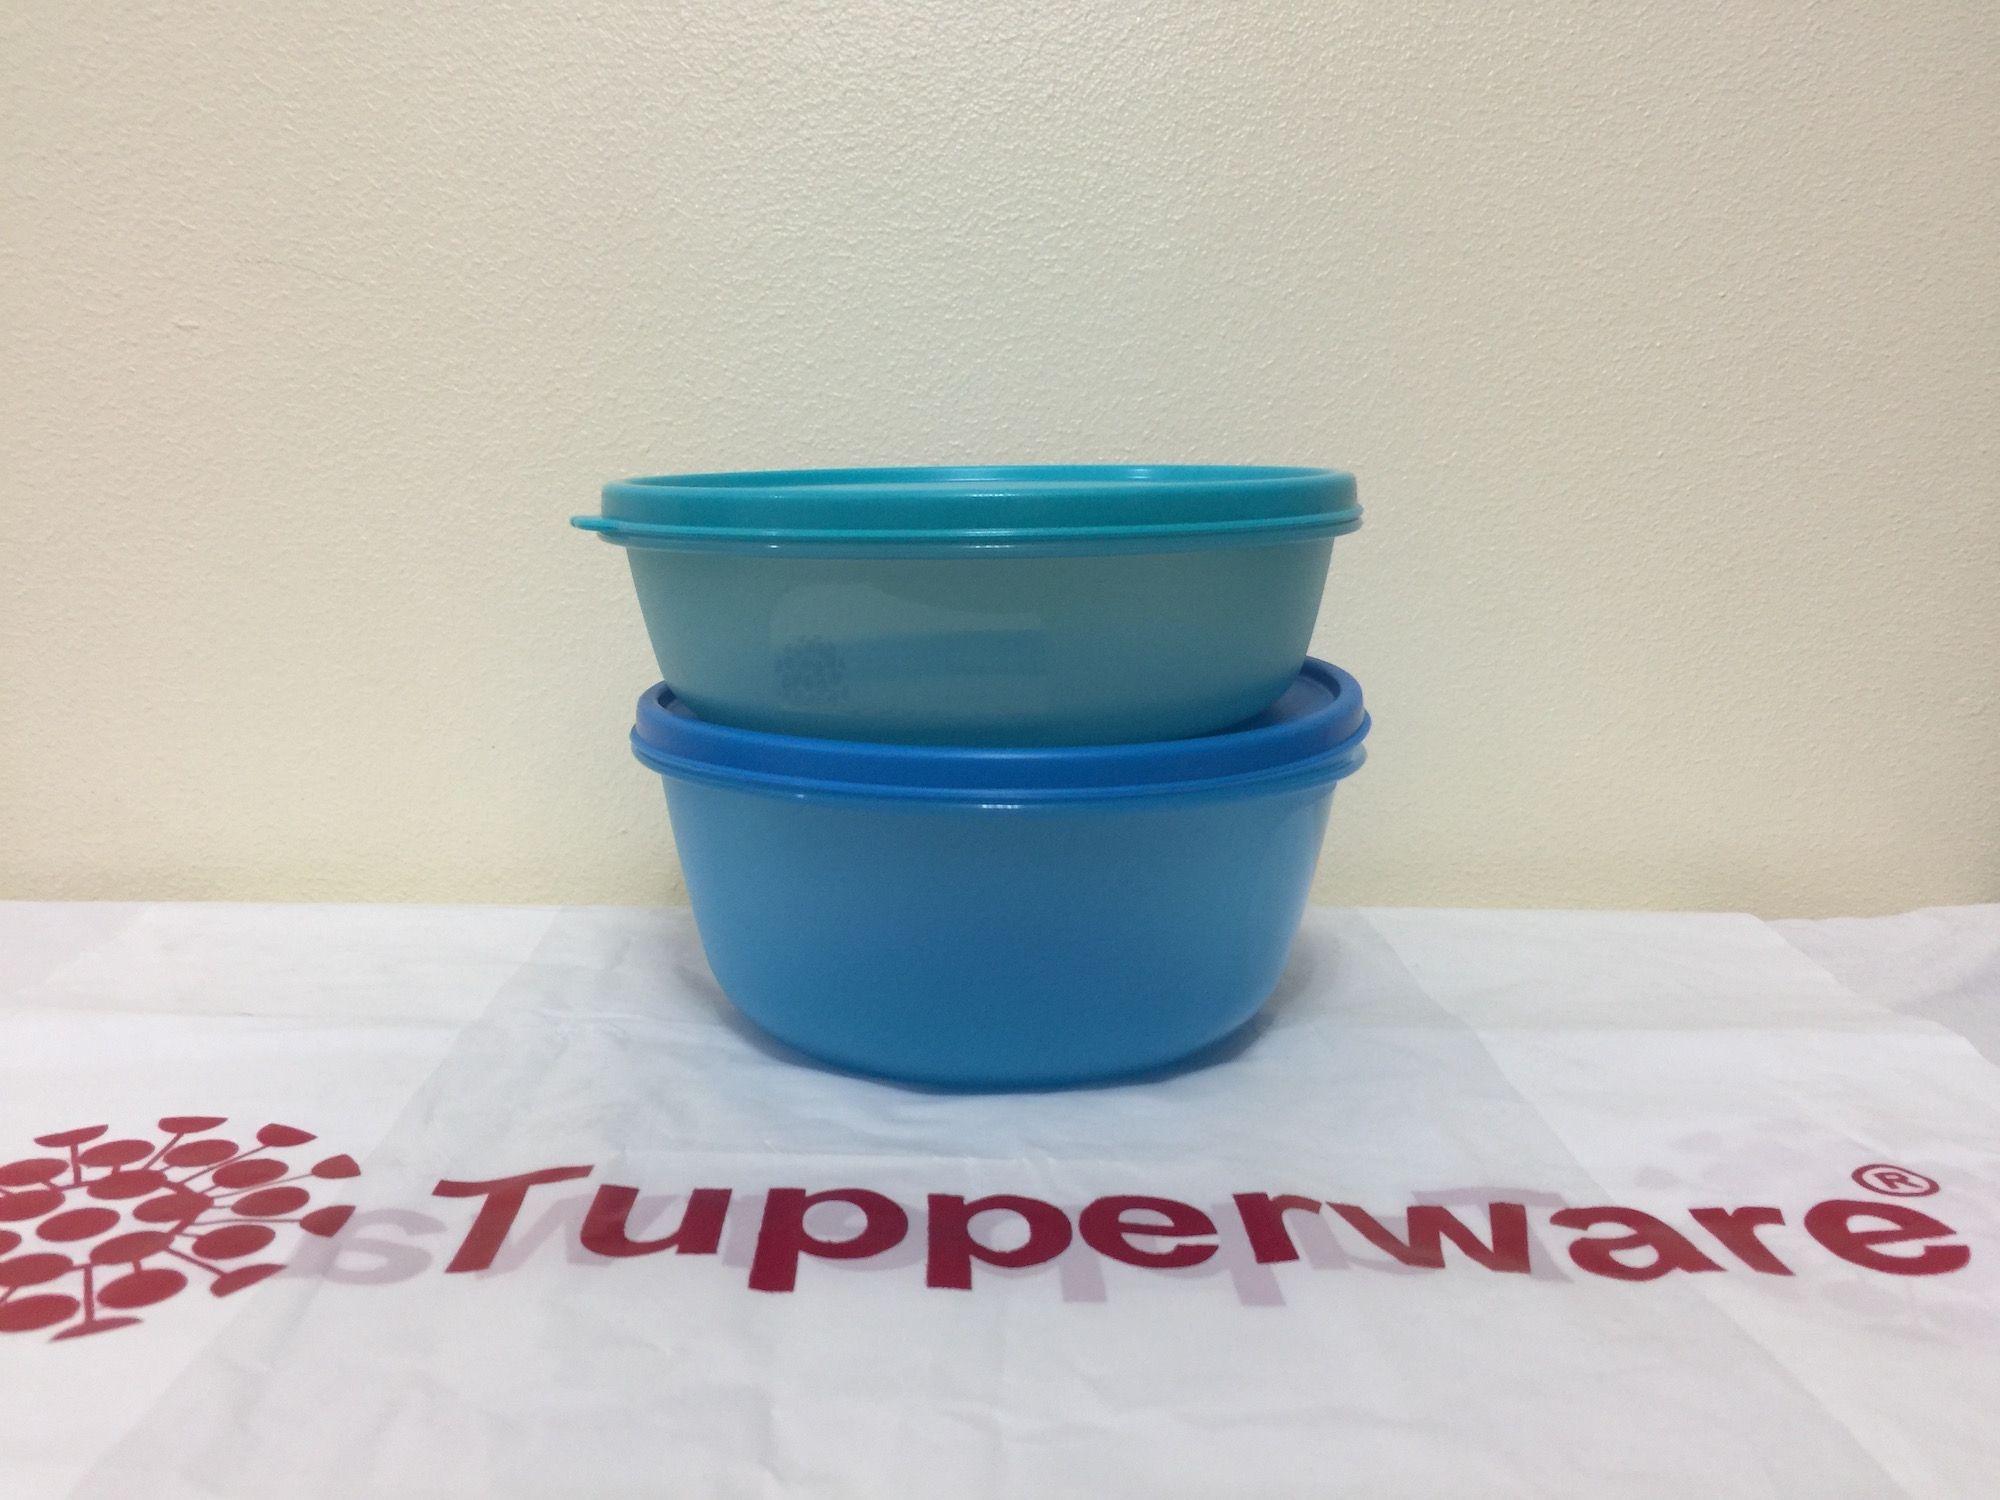 Tupperware Space Saver Bowl Set – 2 Pcs | Laundry & Household ...